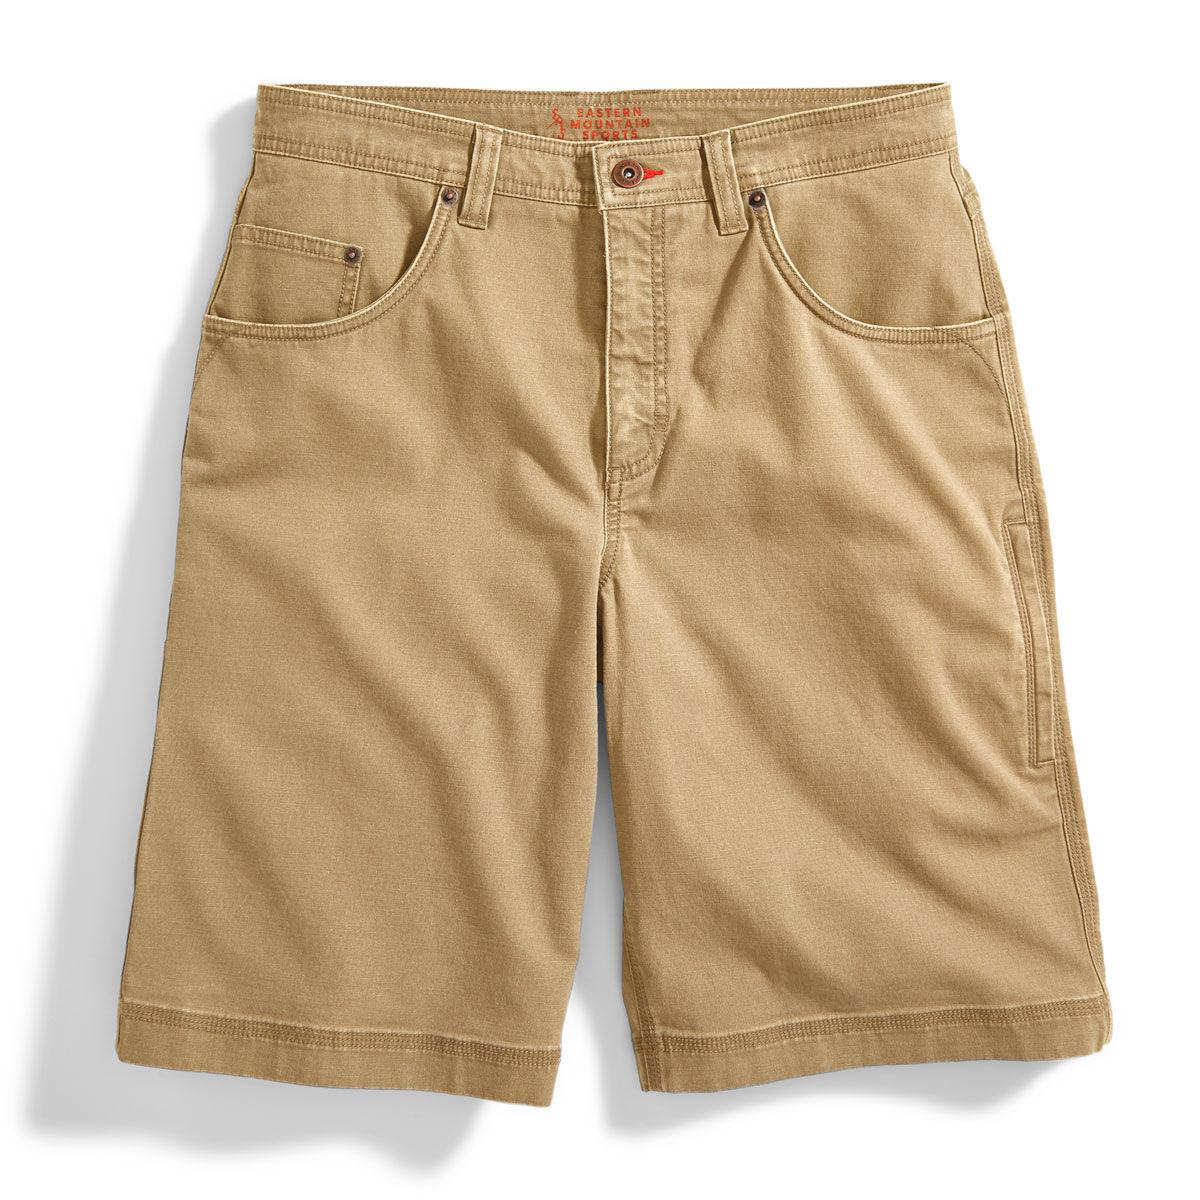 EMS Fencemender Shorts